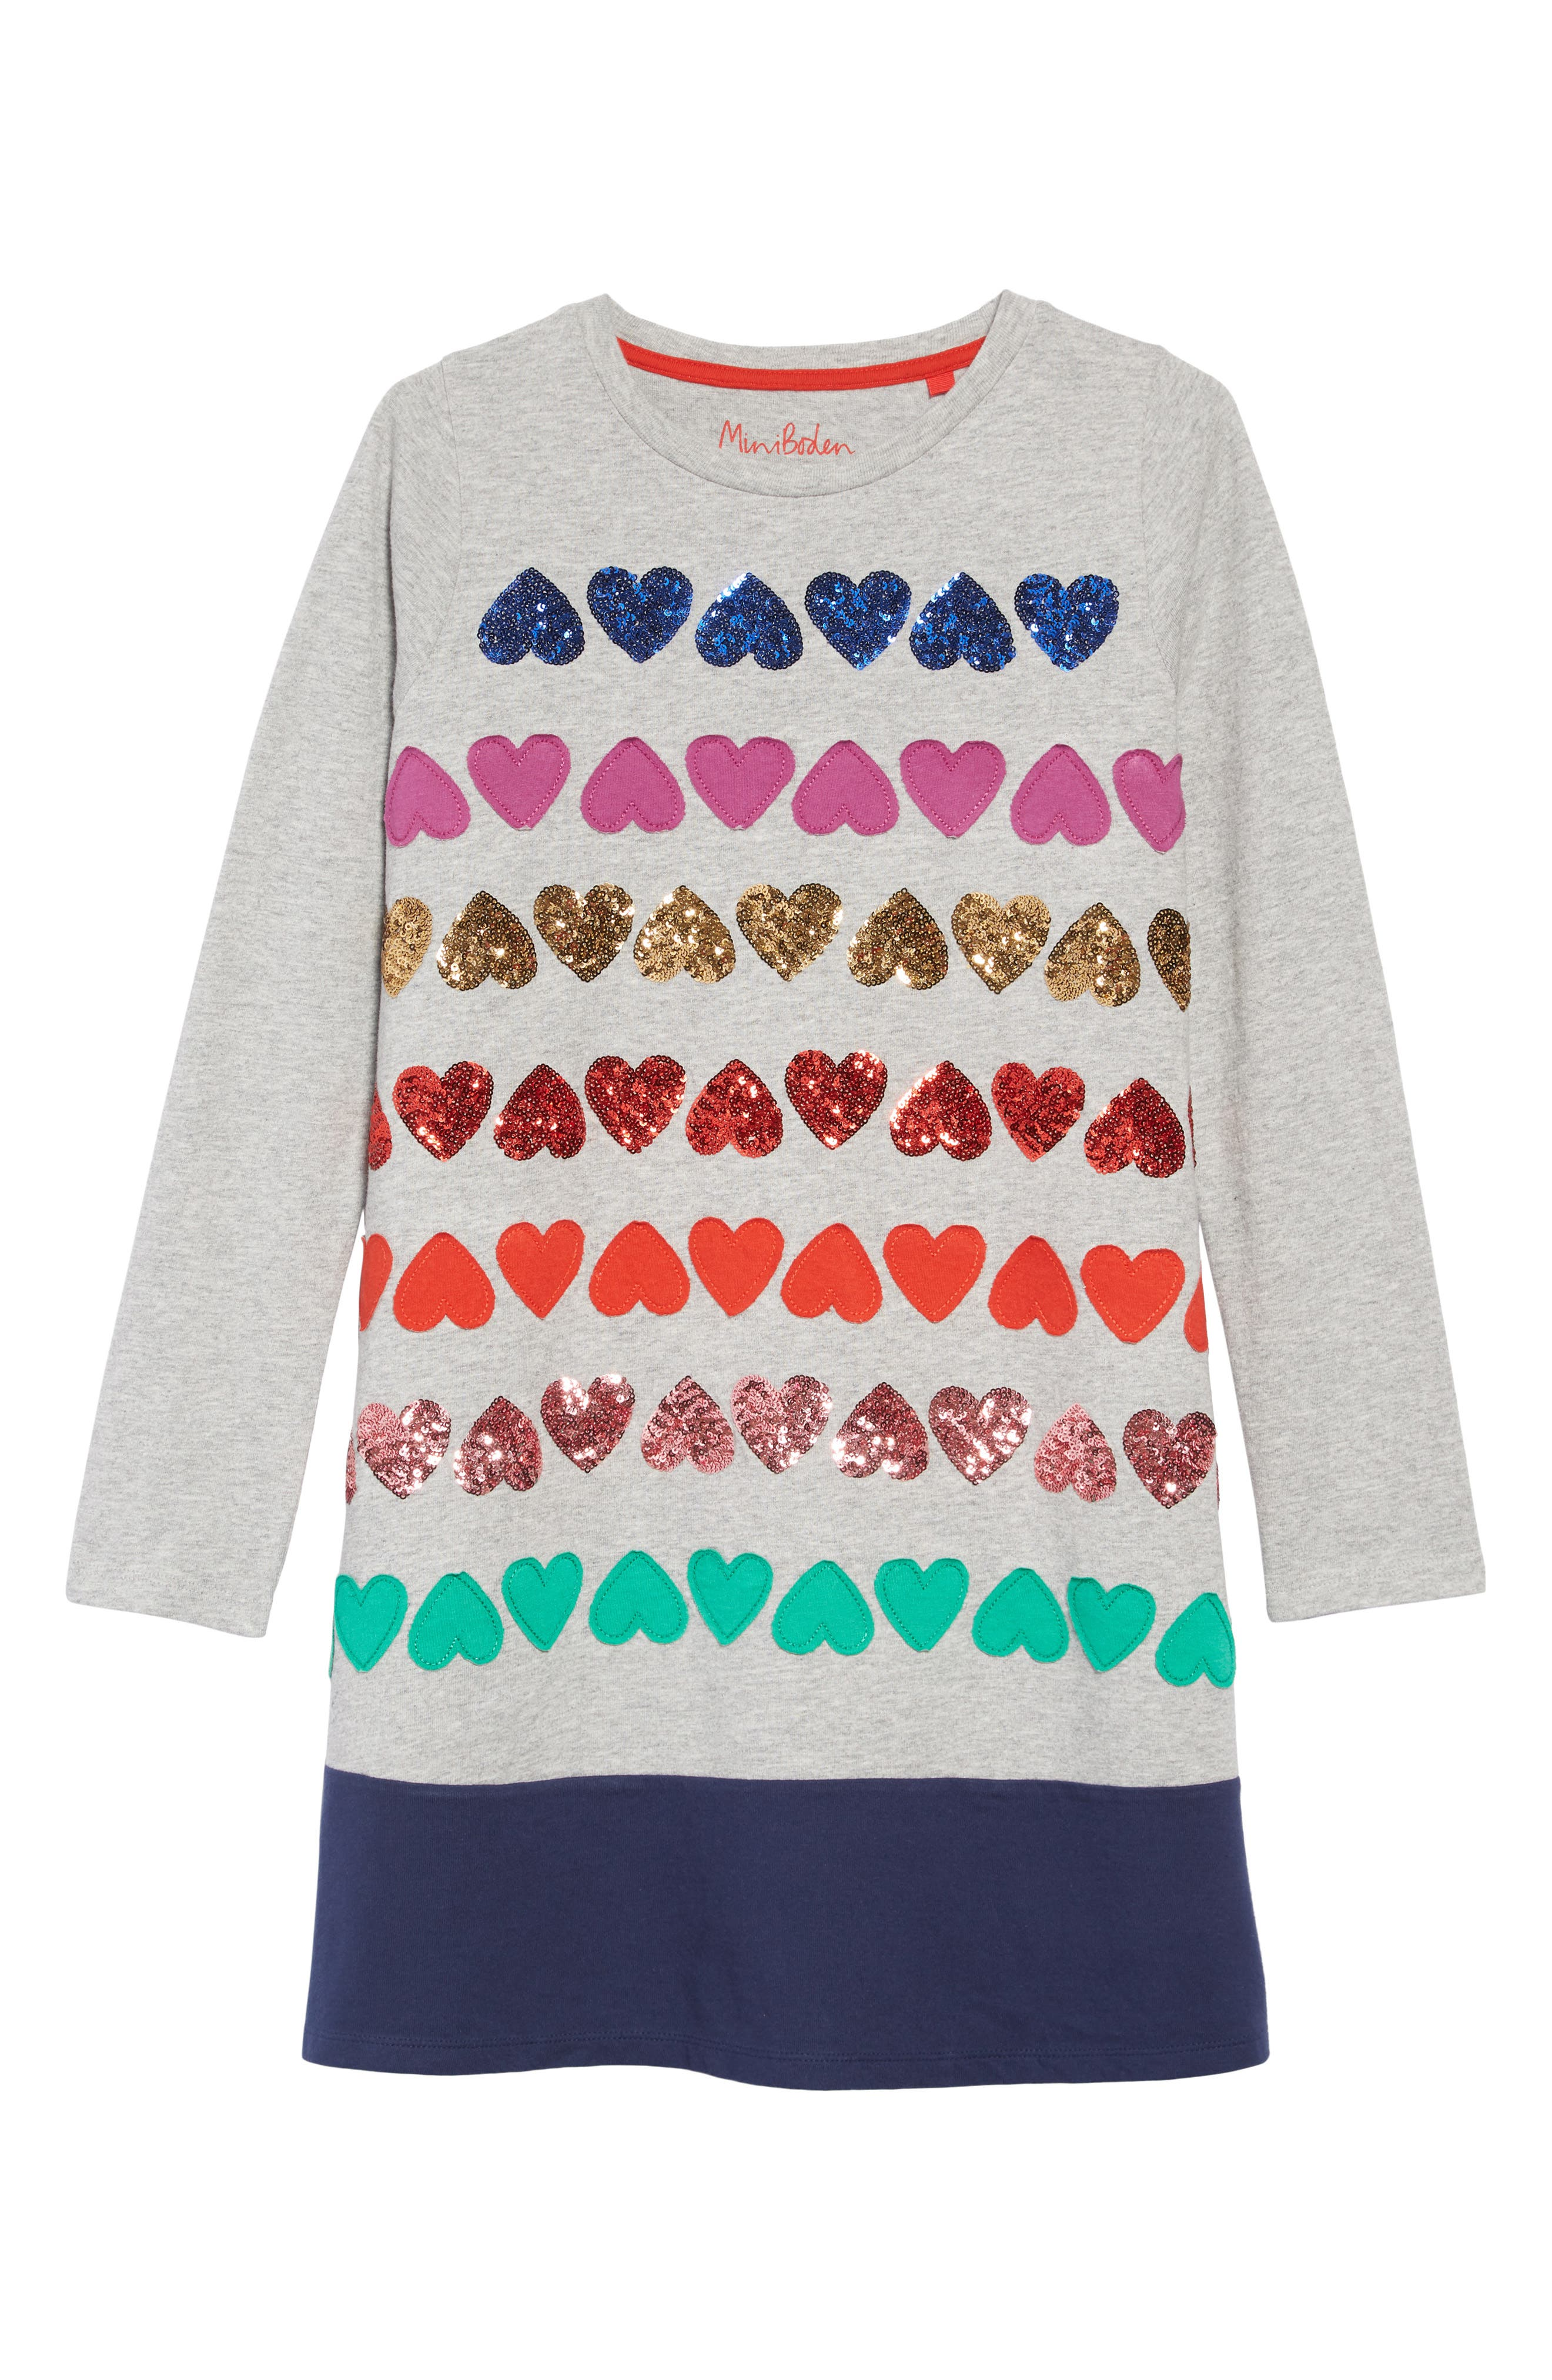 Girls Mini Boden Heart Applique Dress Size 910Y  Grey